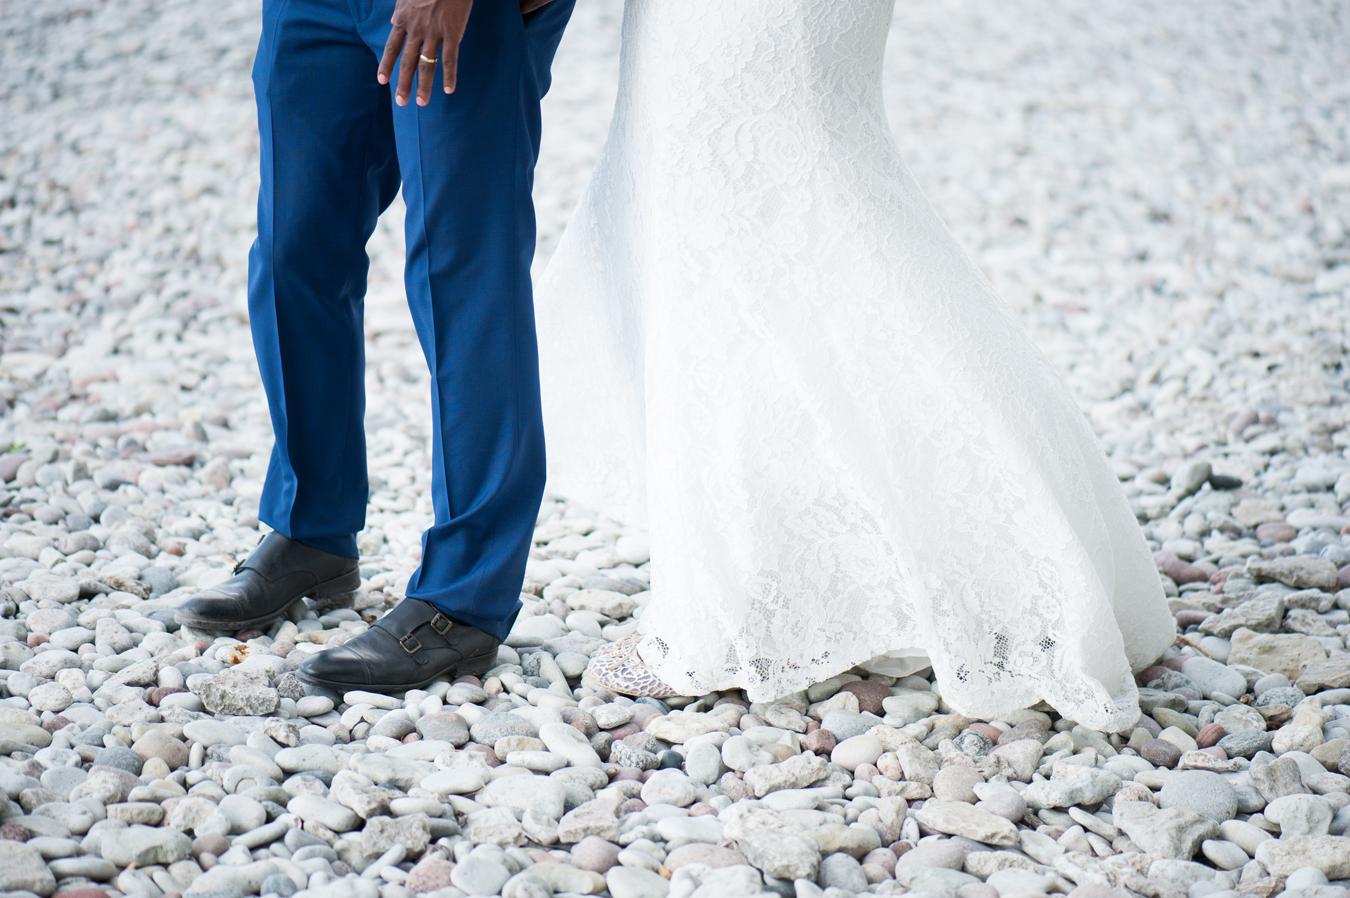 047-bröllop-gotland-fridhem-neas-fotografi.jpg